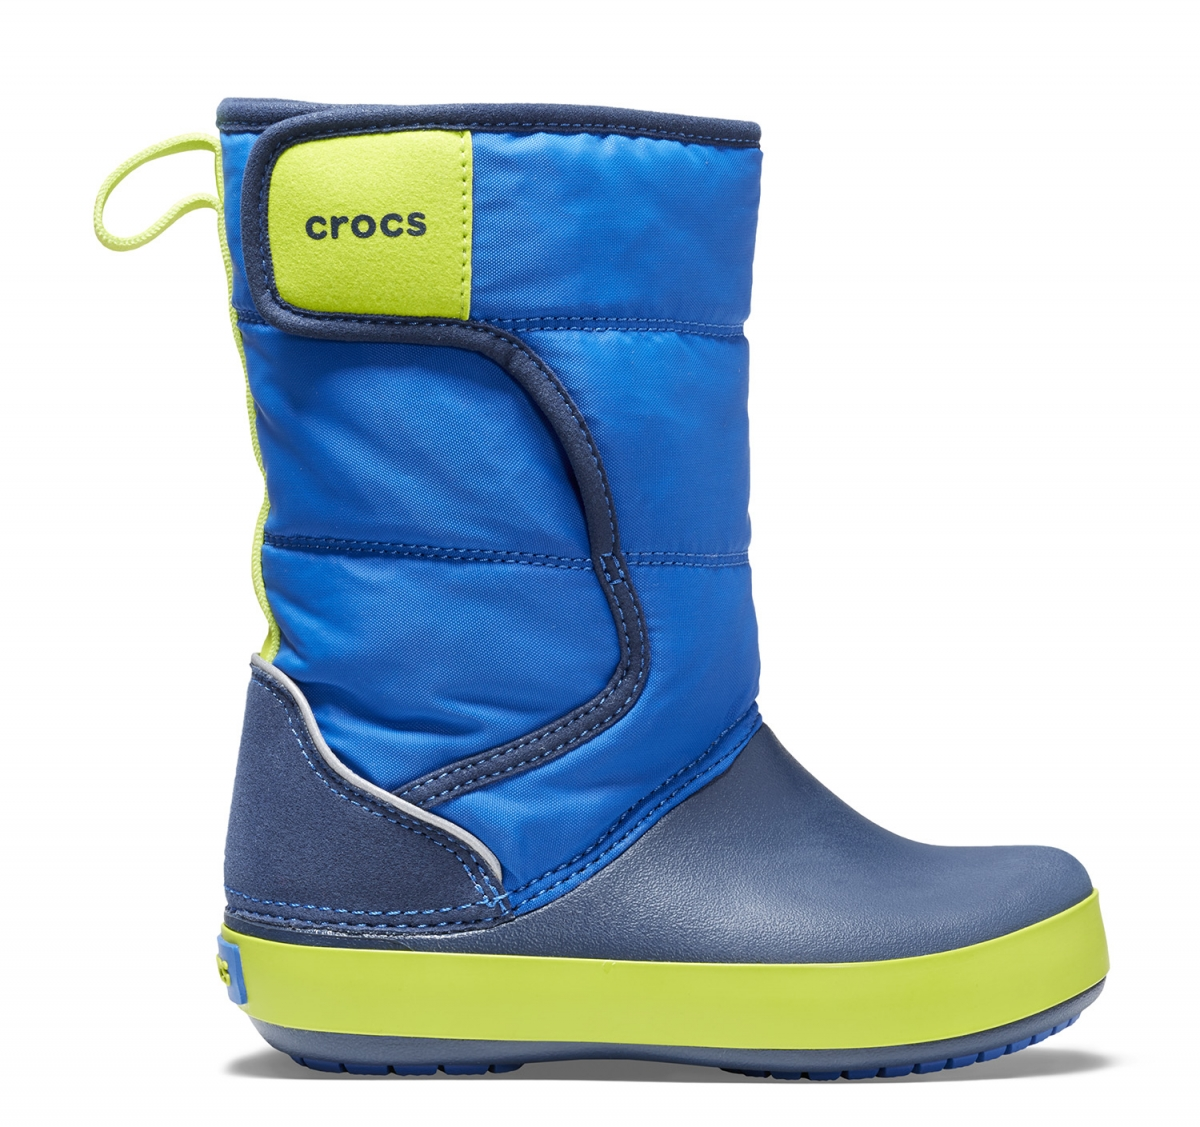 Crocs LodgePoint Snow Boot Kids - Blue Jean/Navy, J1 (32-33)